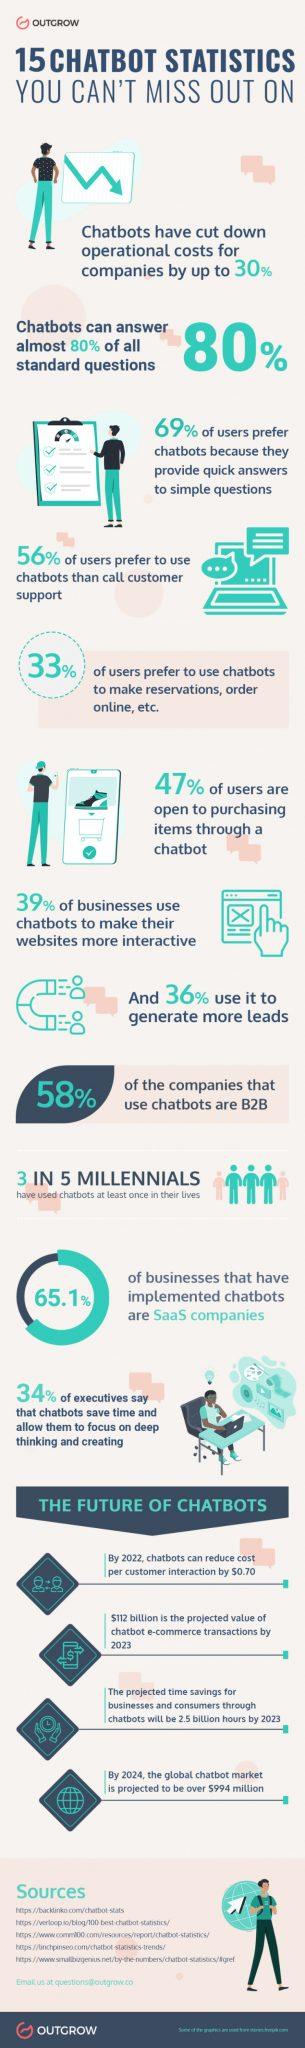 Chatbot statistics infographic